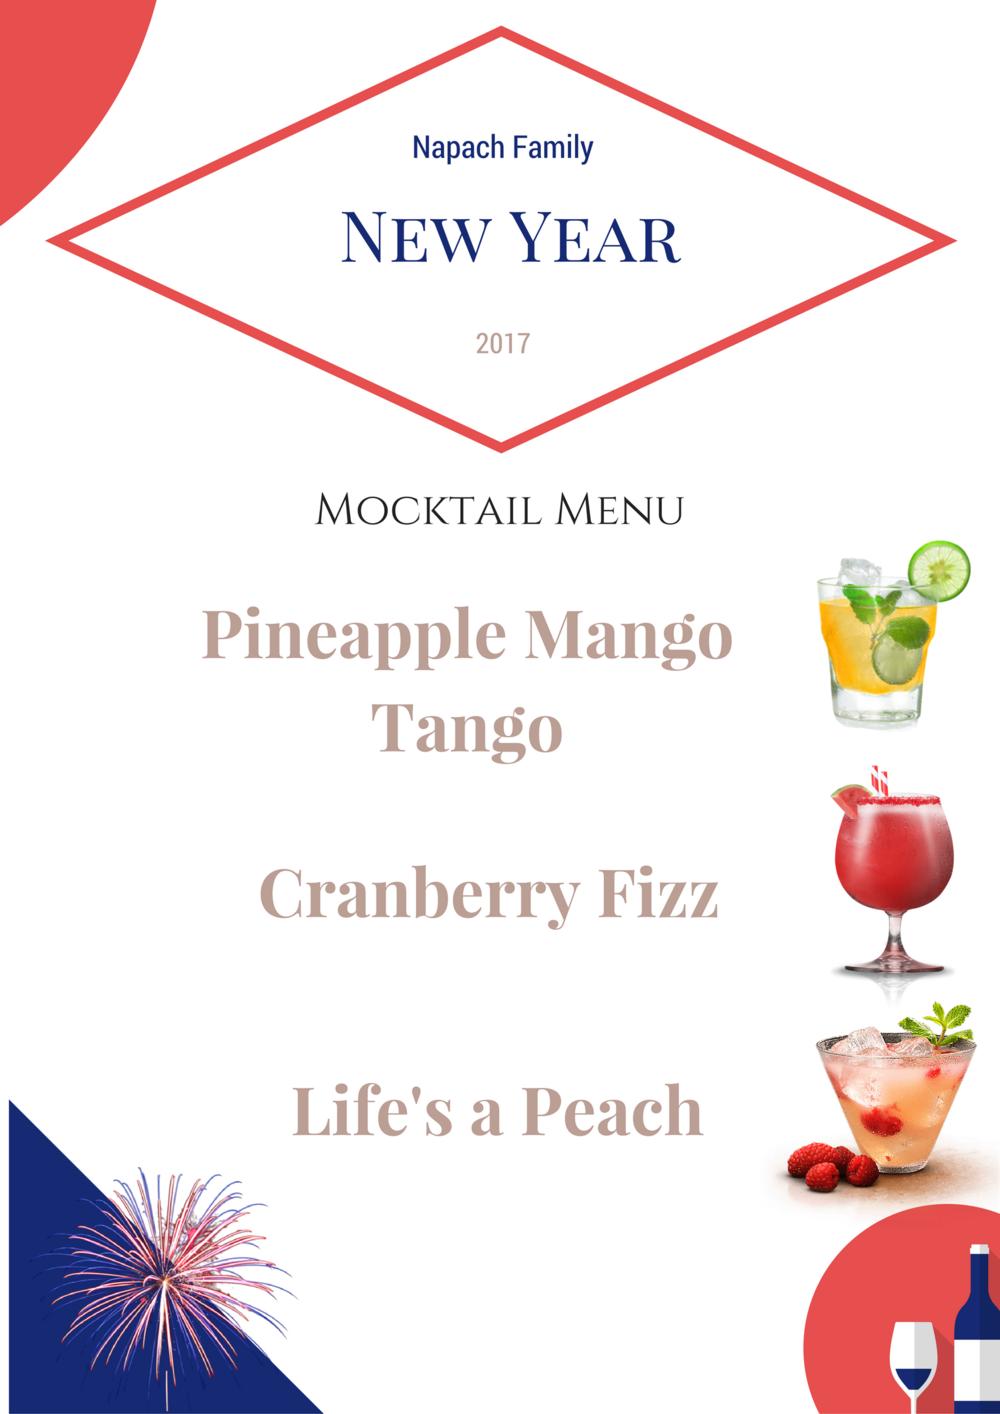 Napach Mocktail Menu.png